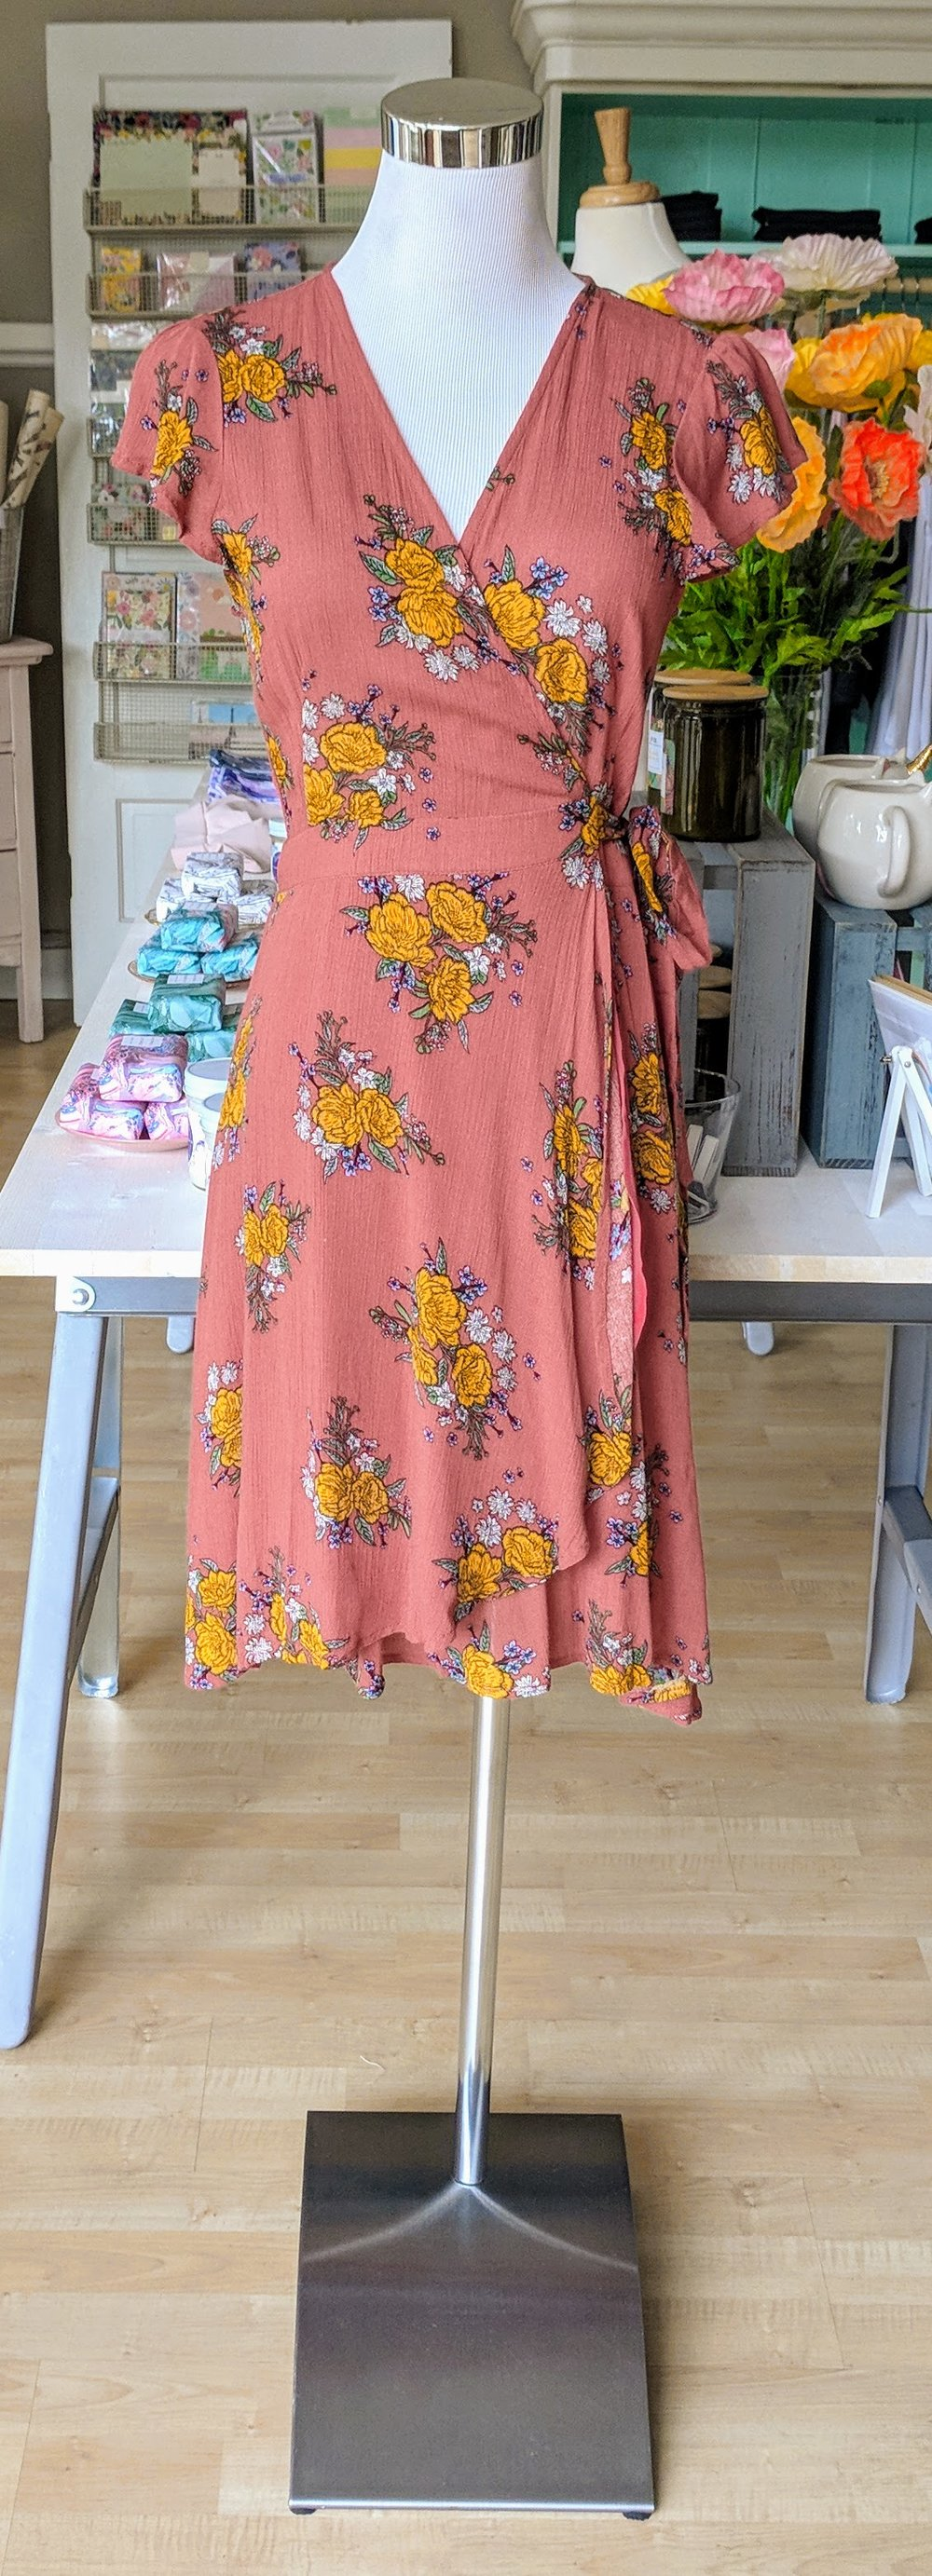 Coral floral print wrap dress.